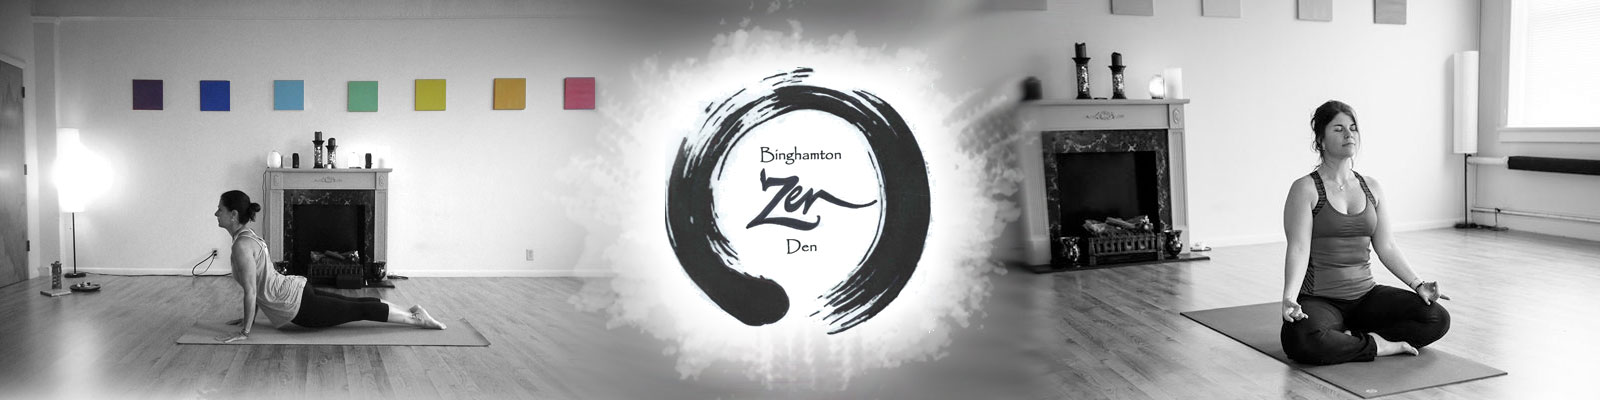 Binghamton Zen Den BiziFit